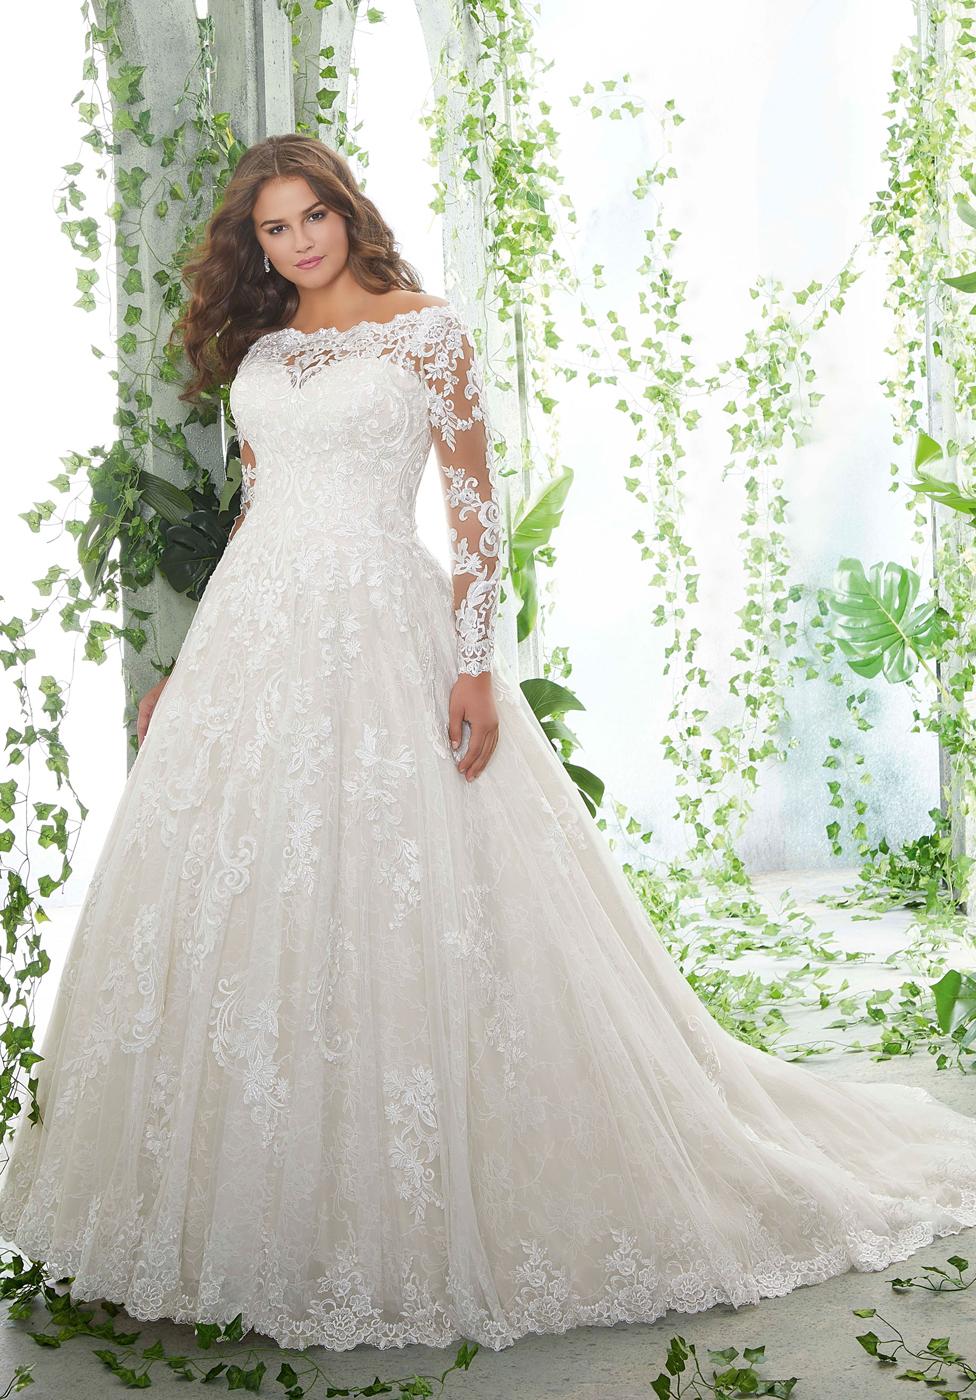 Mori Lee 3258 Patience Dress - MadameBridal.com